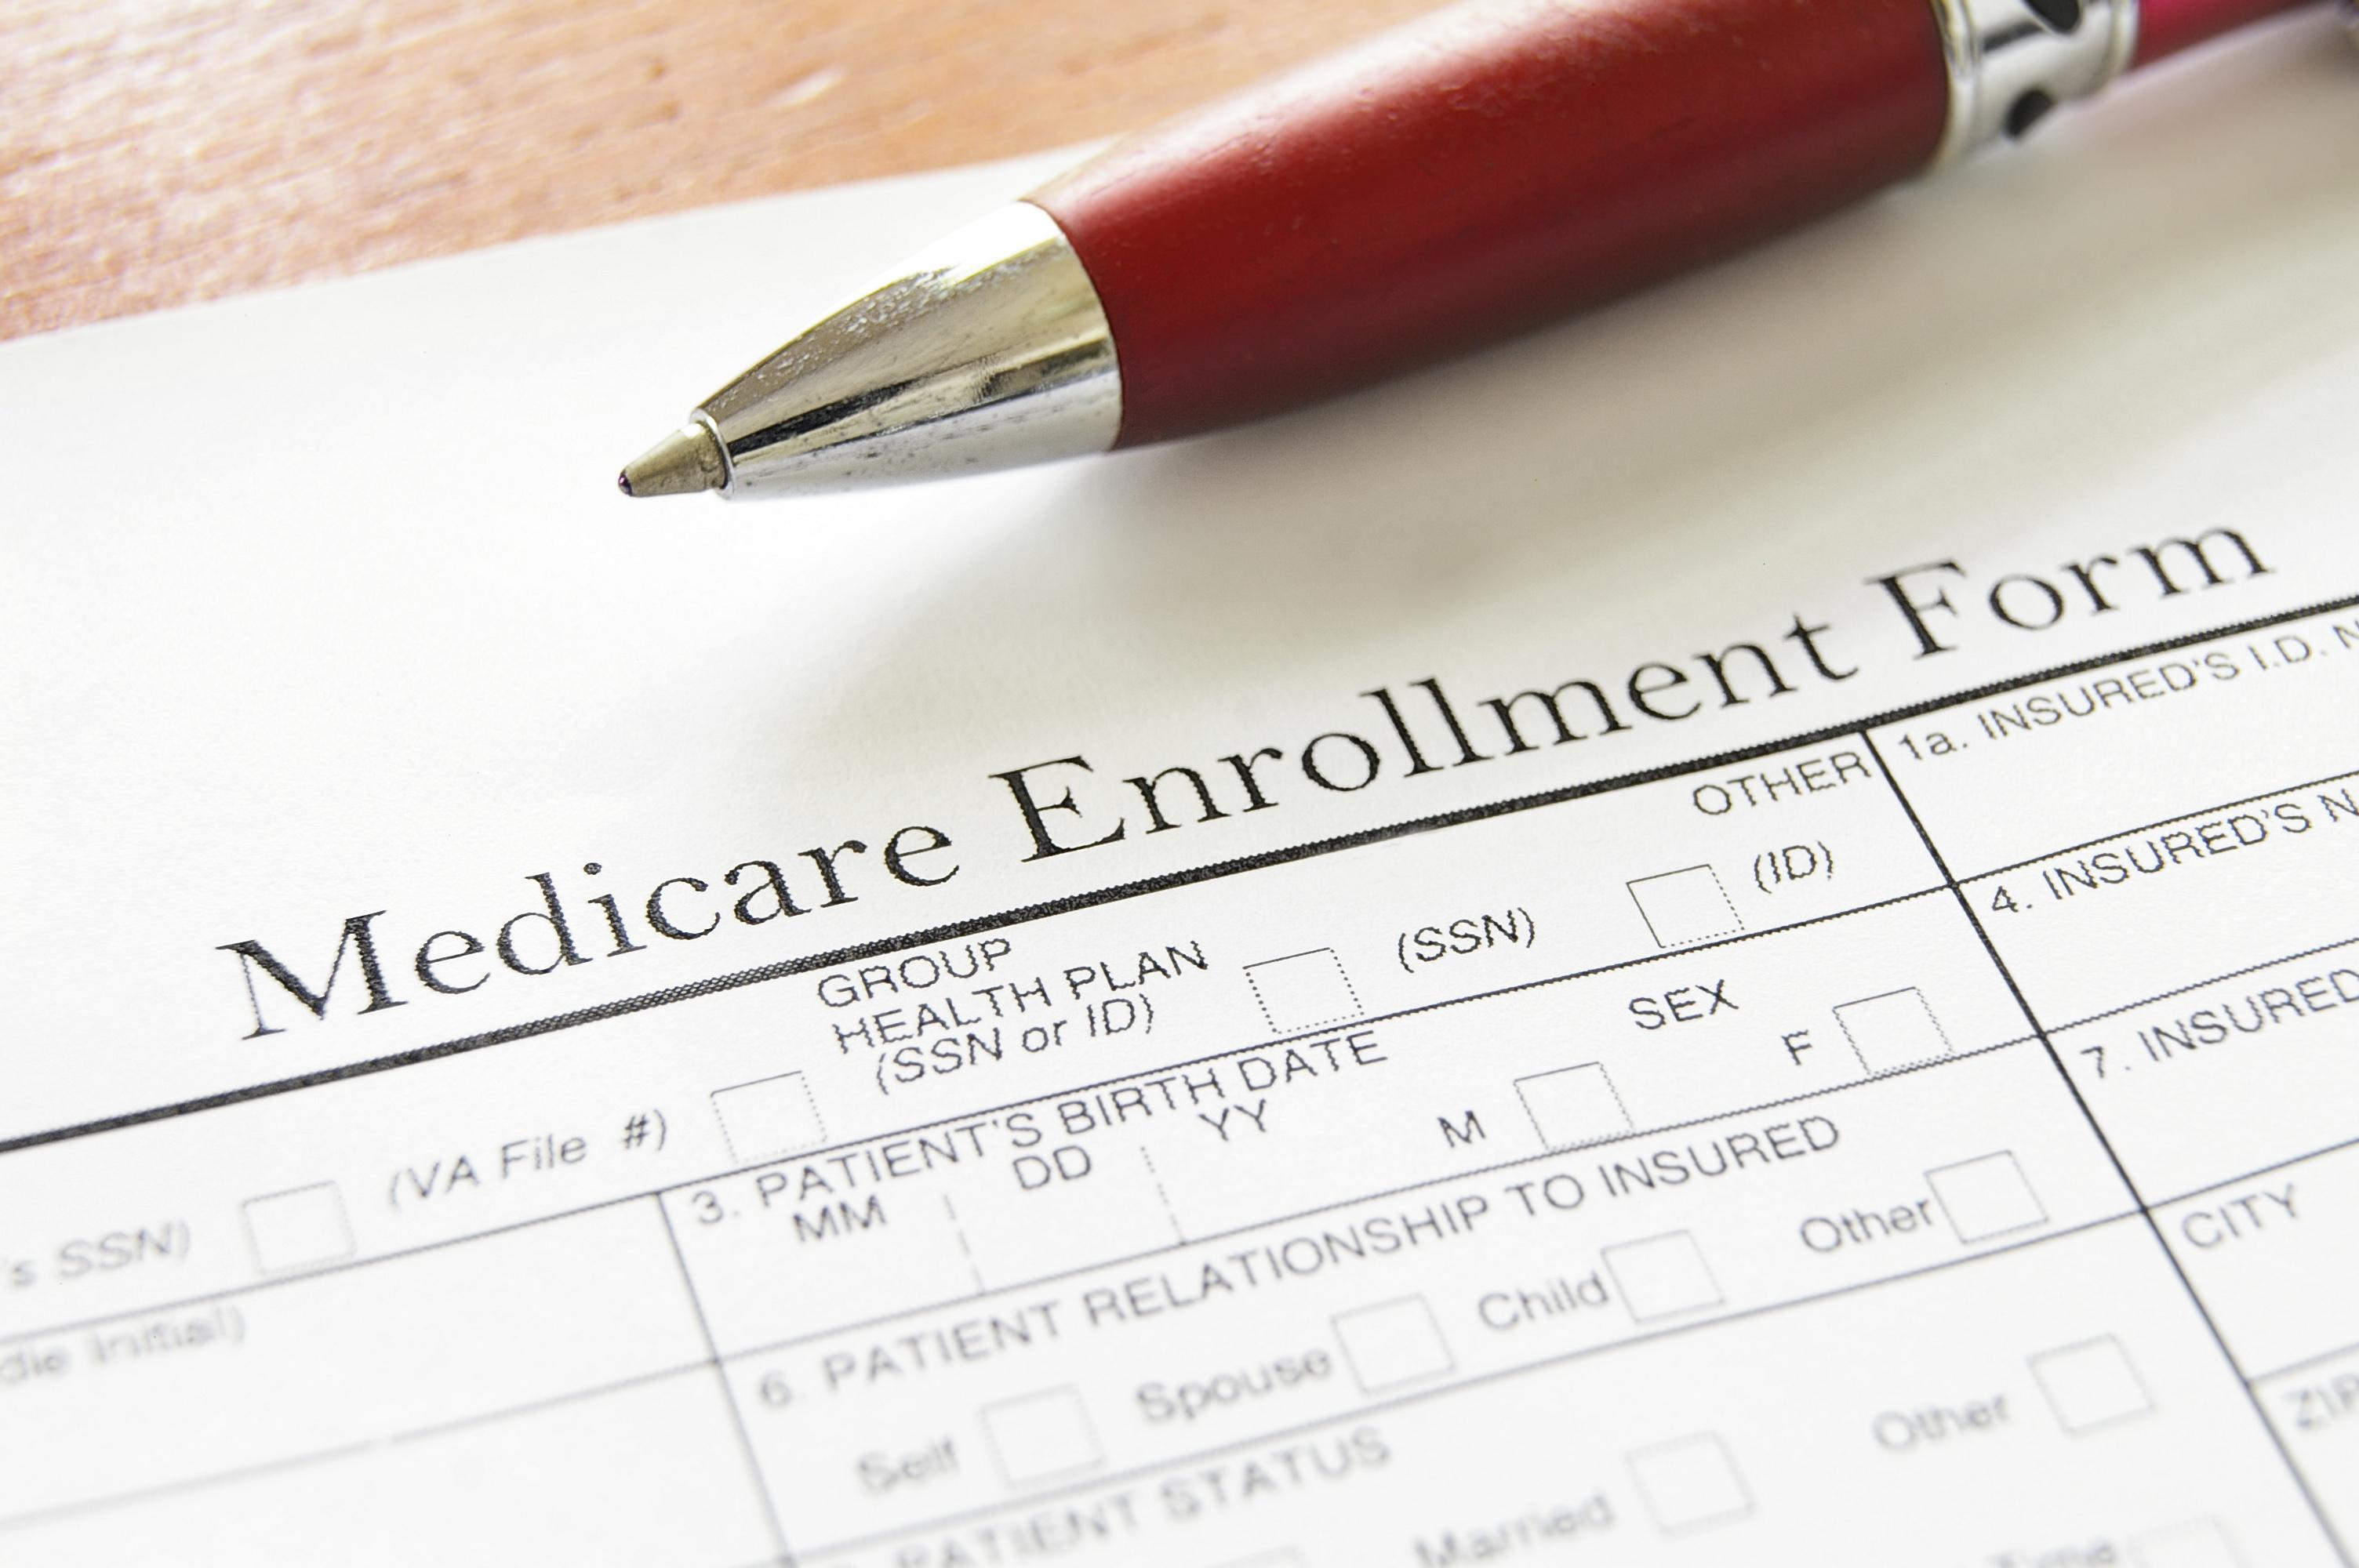 A person filling out a Medicare enrollment form.